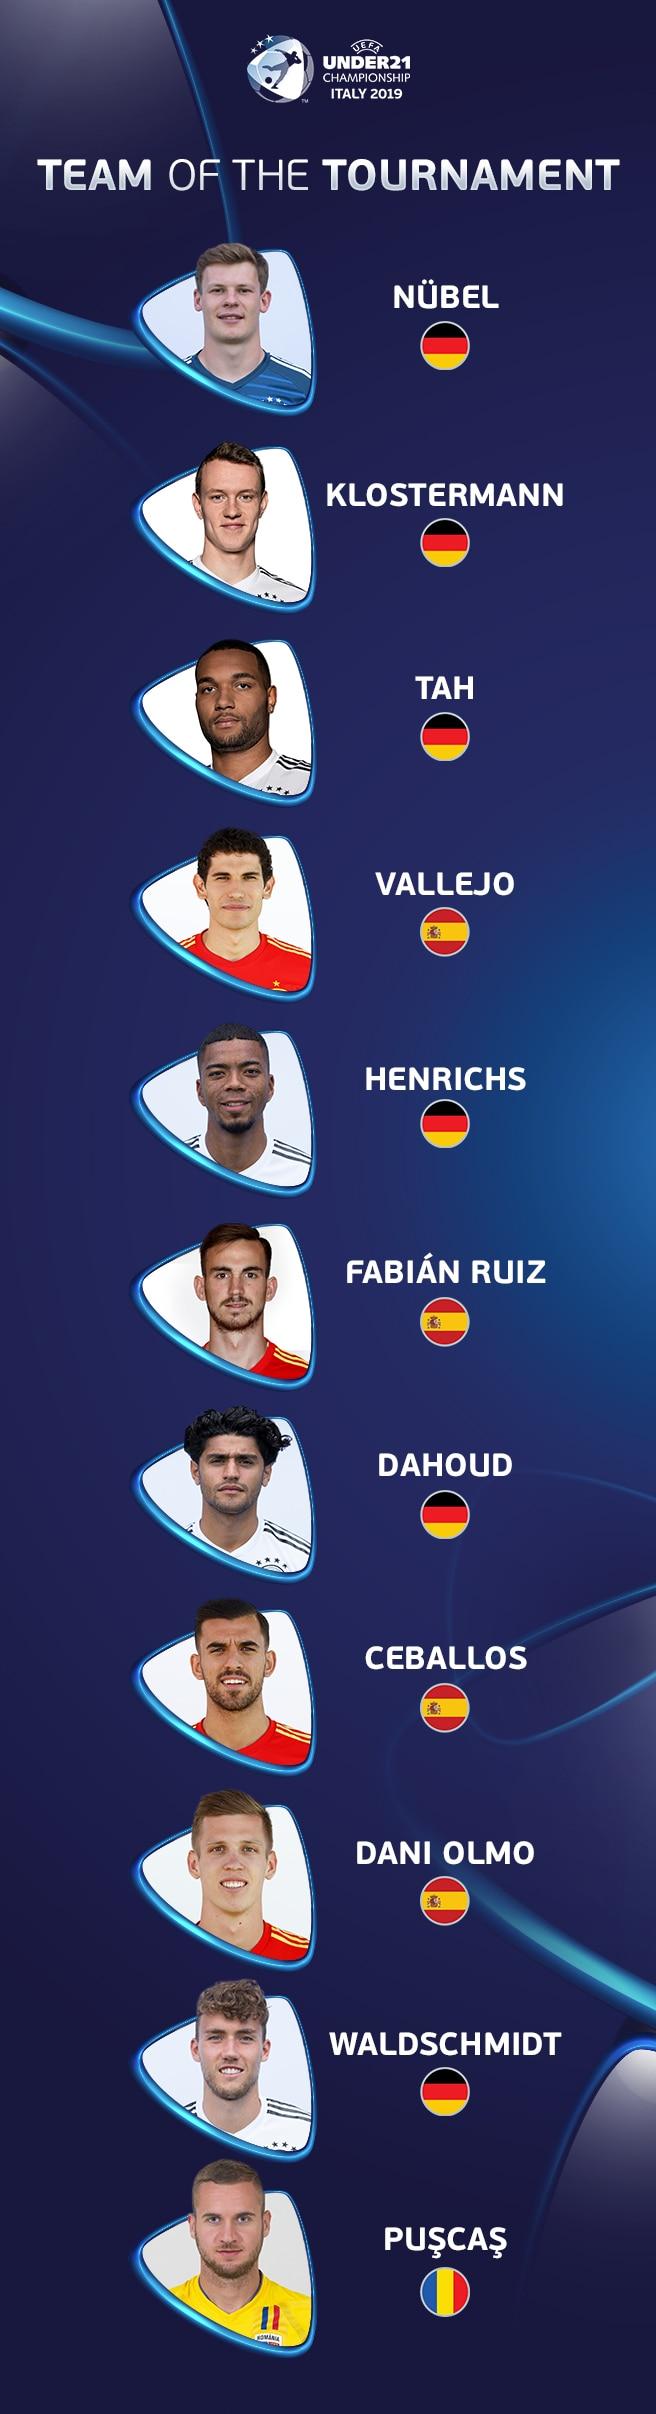 2019 U21 EURO Team of the Tournament